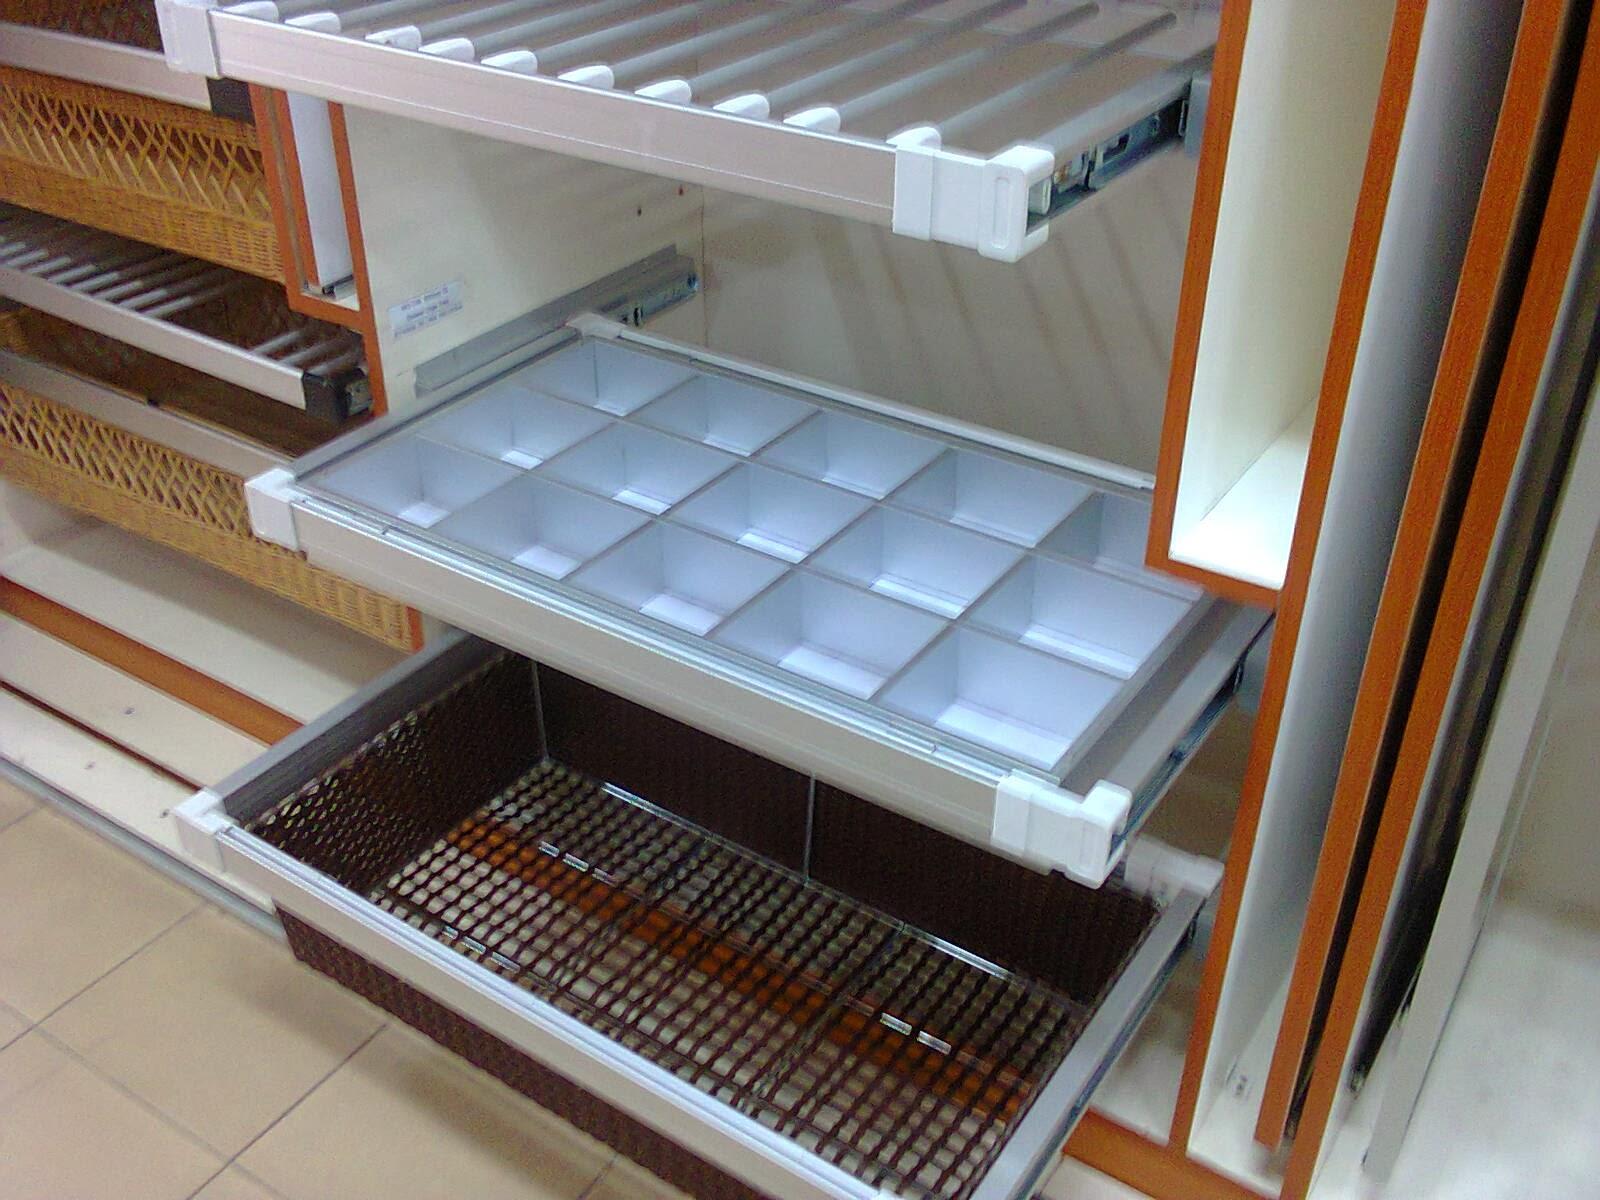 Kabinet dapur and table top design kitchen cabinet design for Design kuchenaccessoires